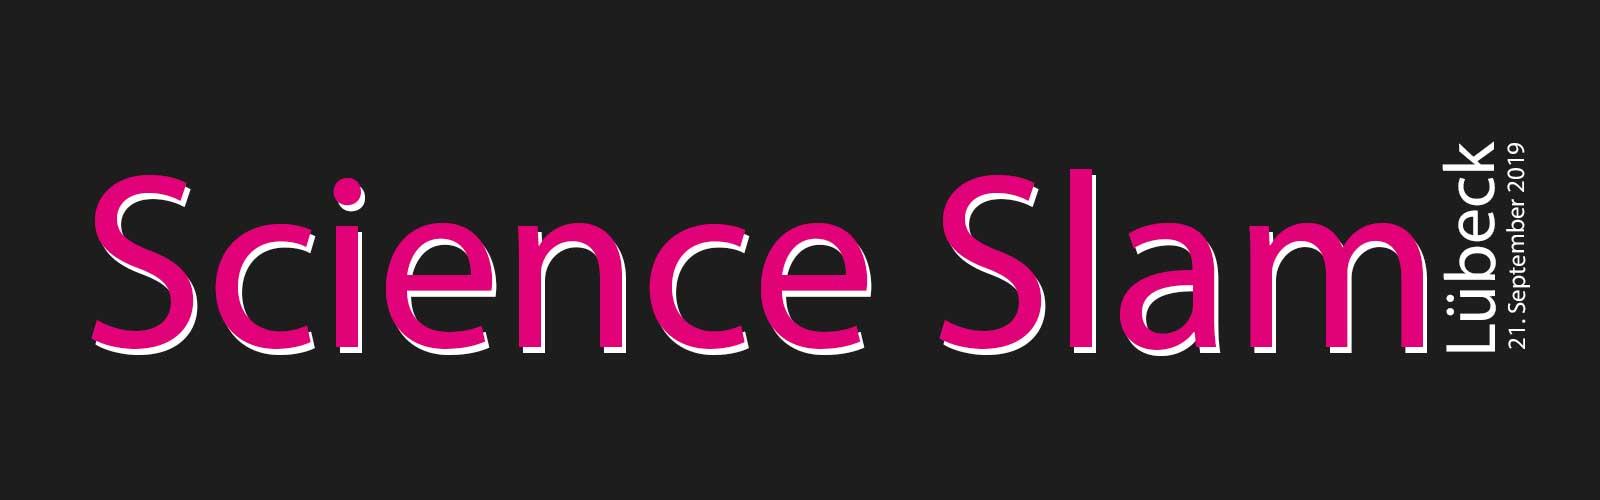 Science Slam Septemper 2019